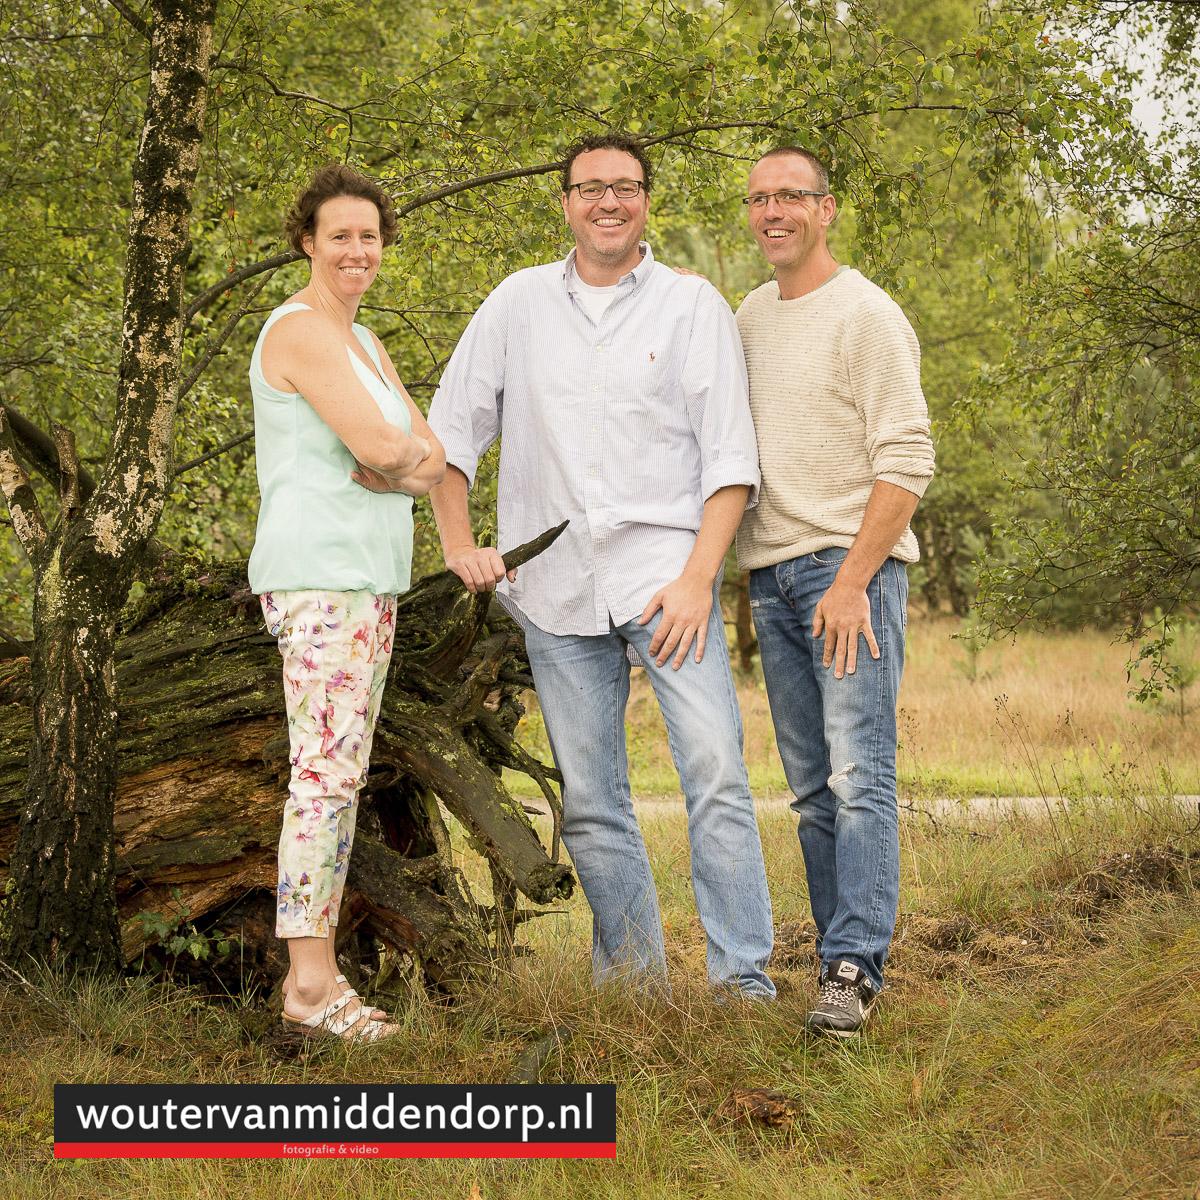 fotografie Wouter van Middendorp, Veluwe omgeving Uddel, Nunspeet, Barneveld, Putten, Landal Rabbit Hill (4)